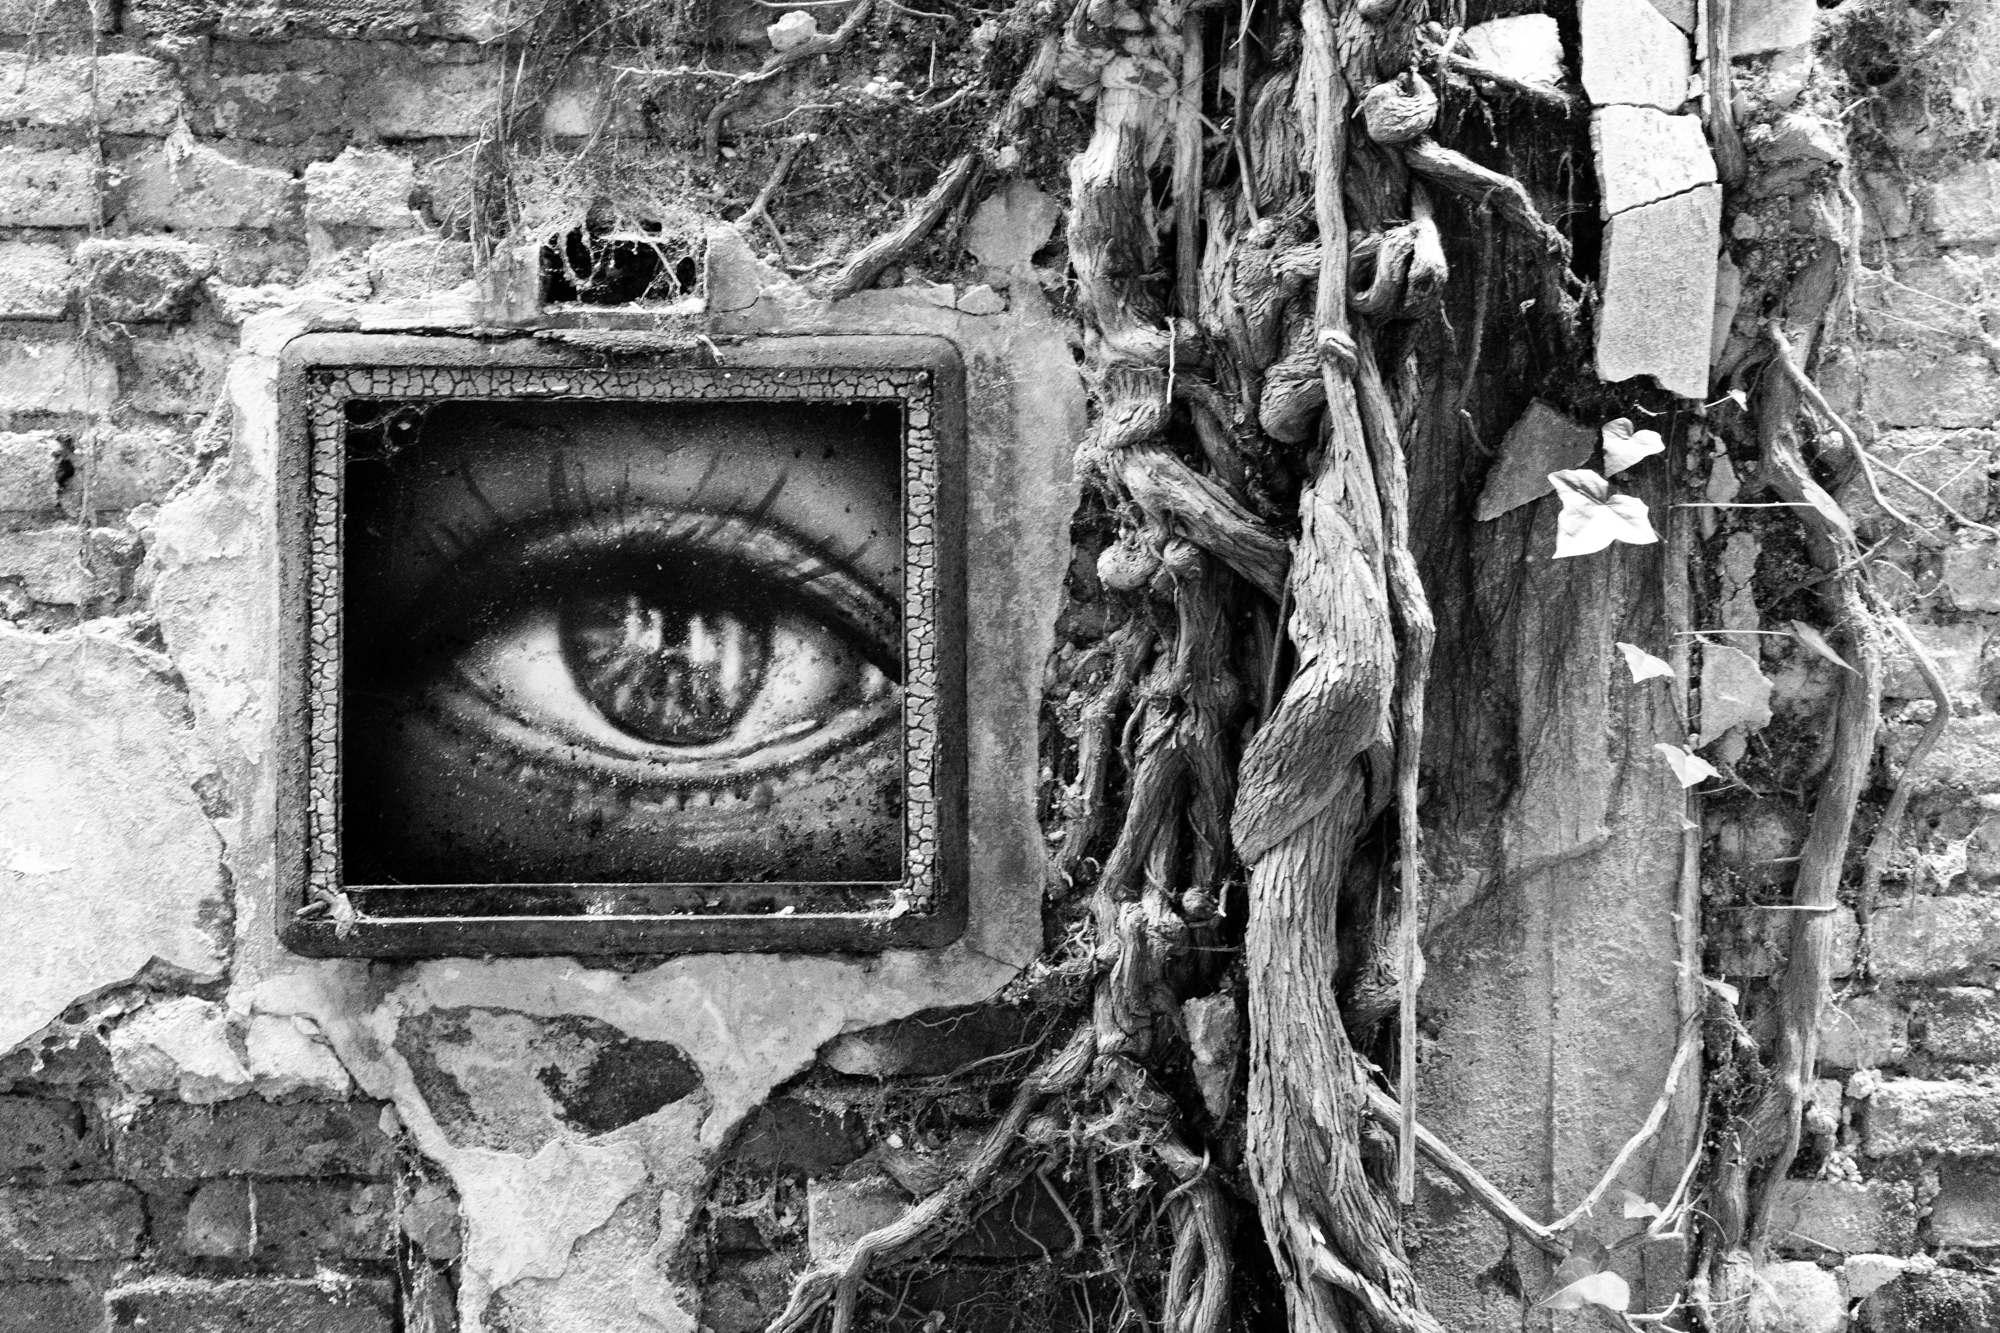 Graffiti of an eye near a tree